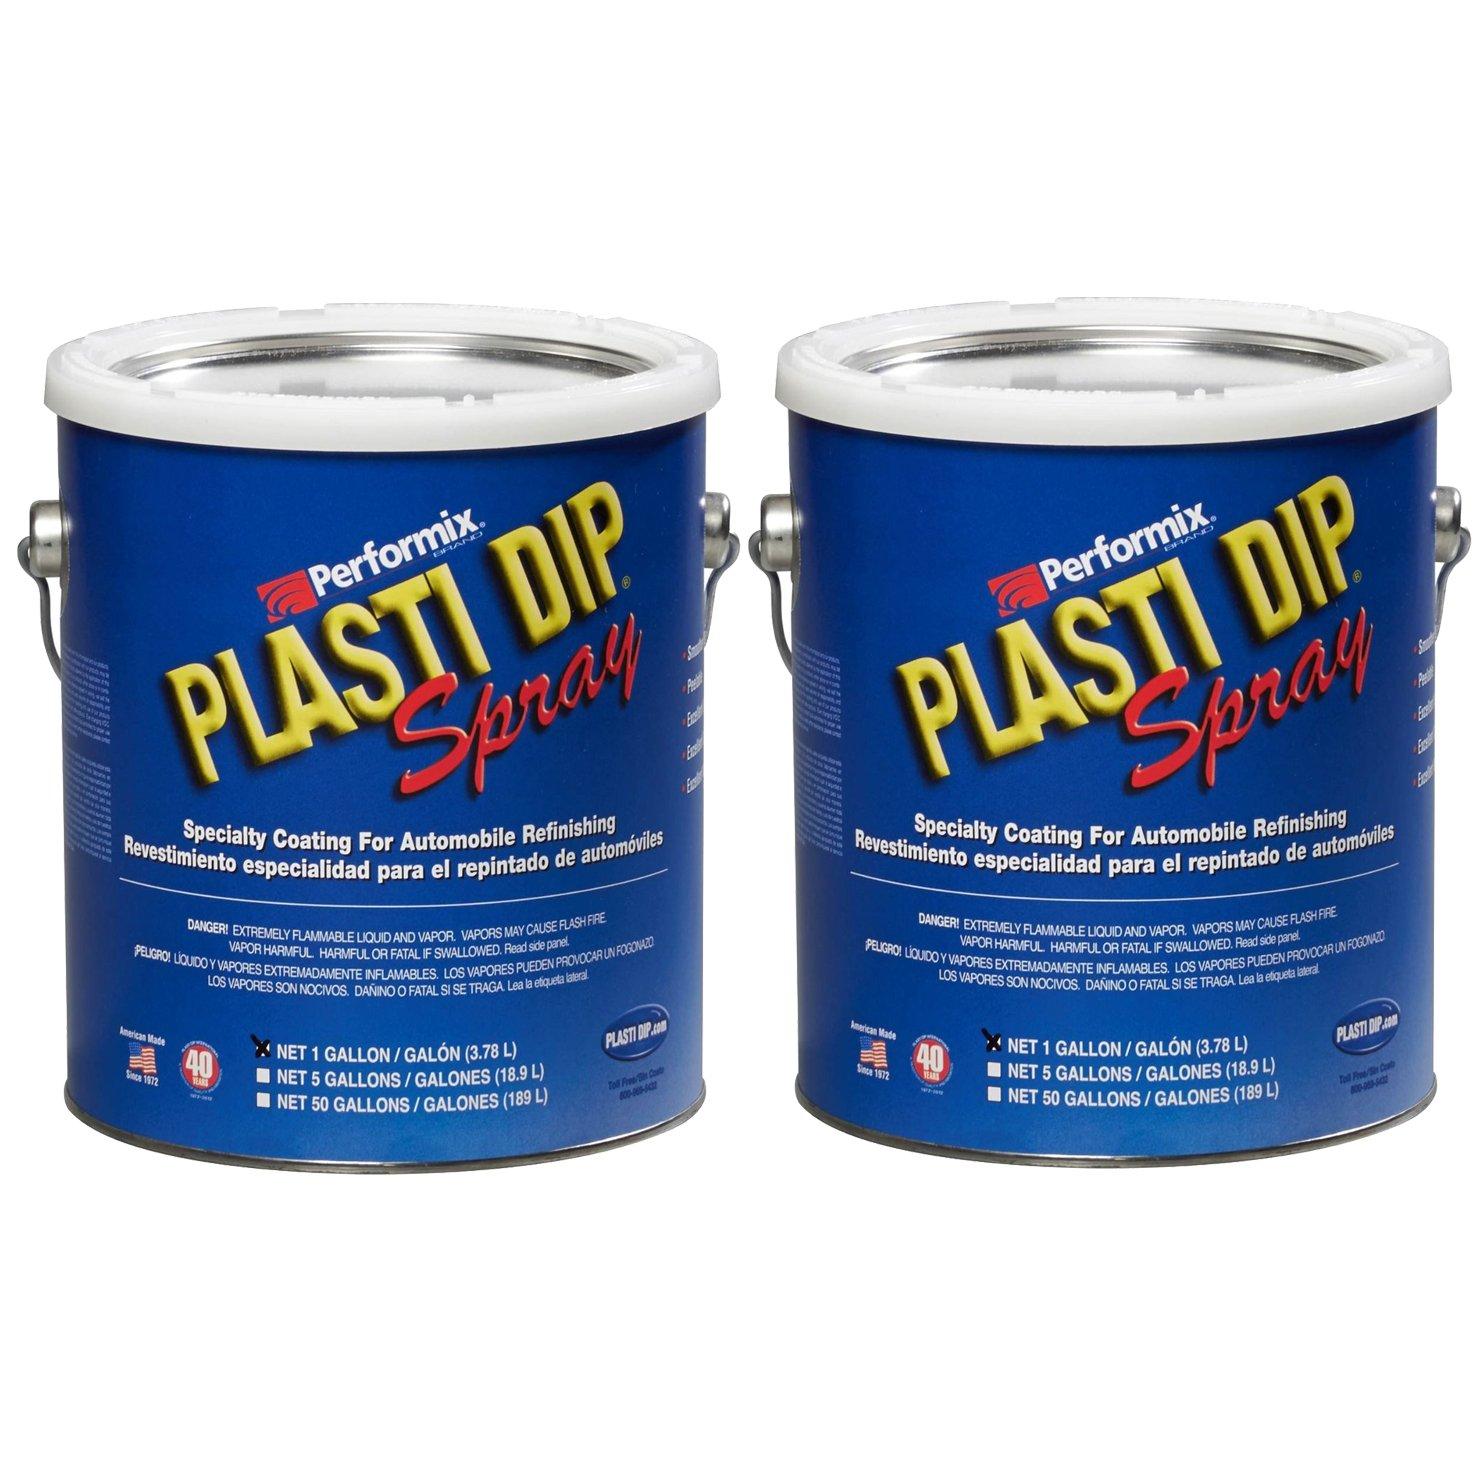 Plasti Dip Multi Purpose Rubber Coating Spray - Camo Tan - 1 Gallon (Pack of 2)